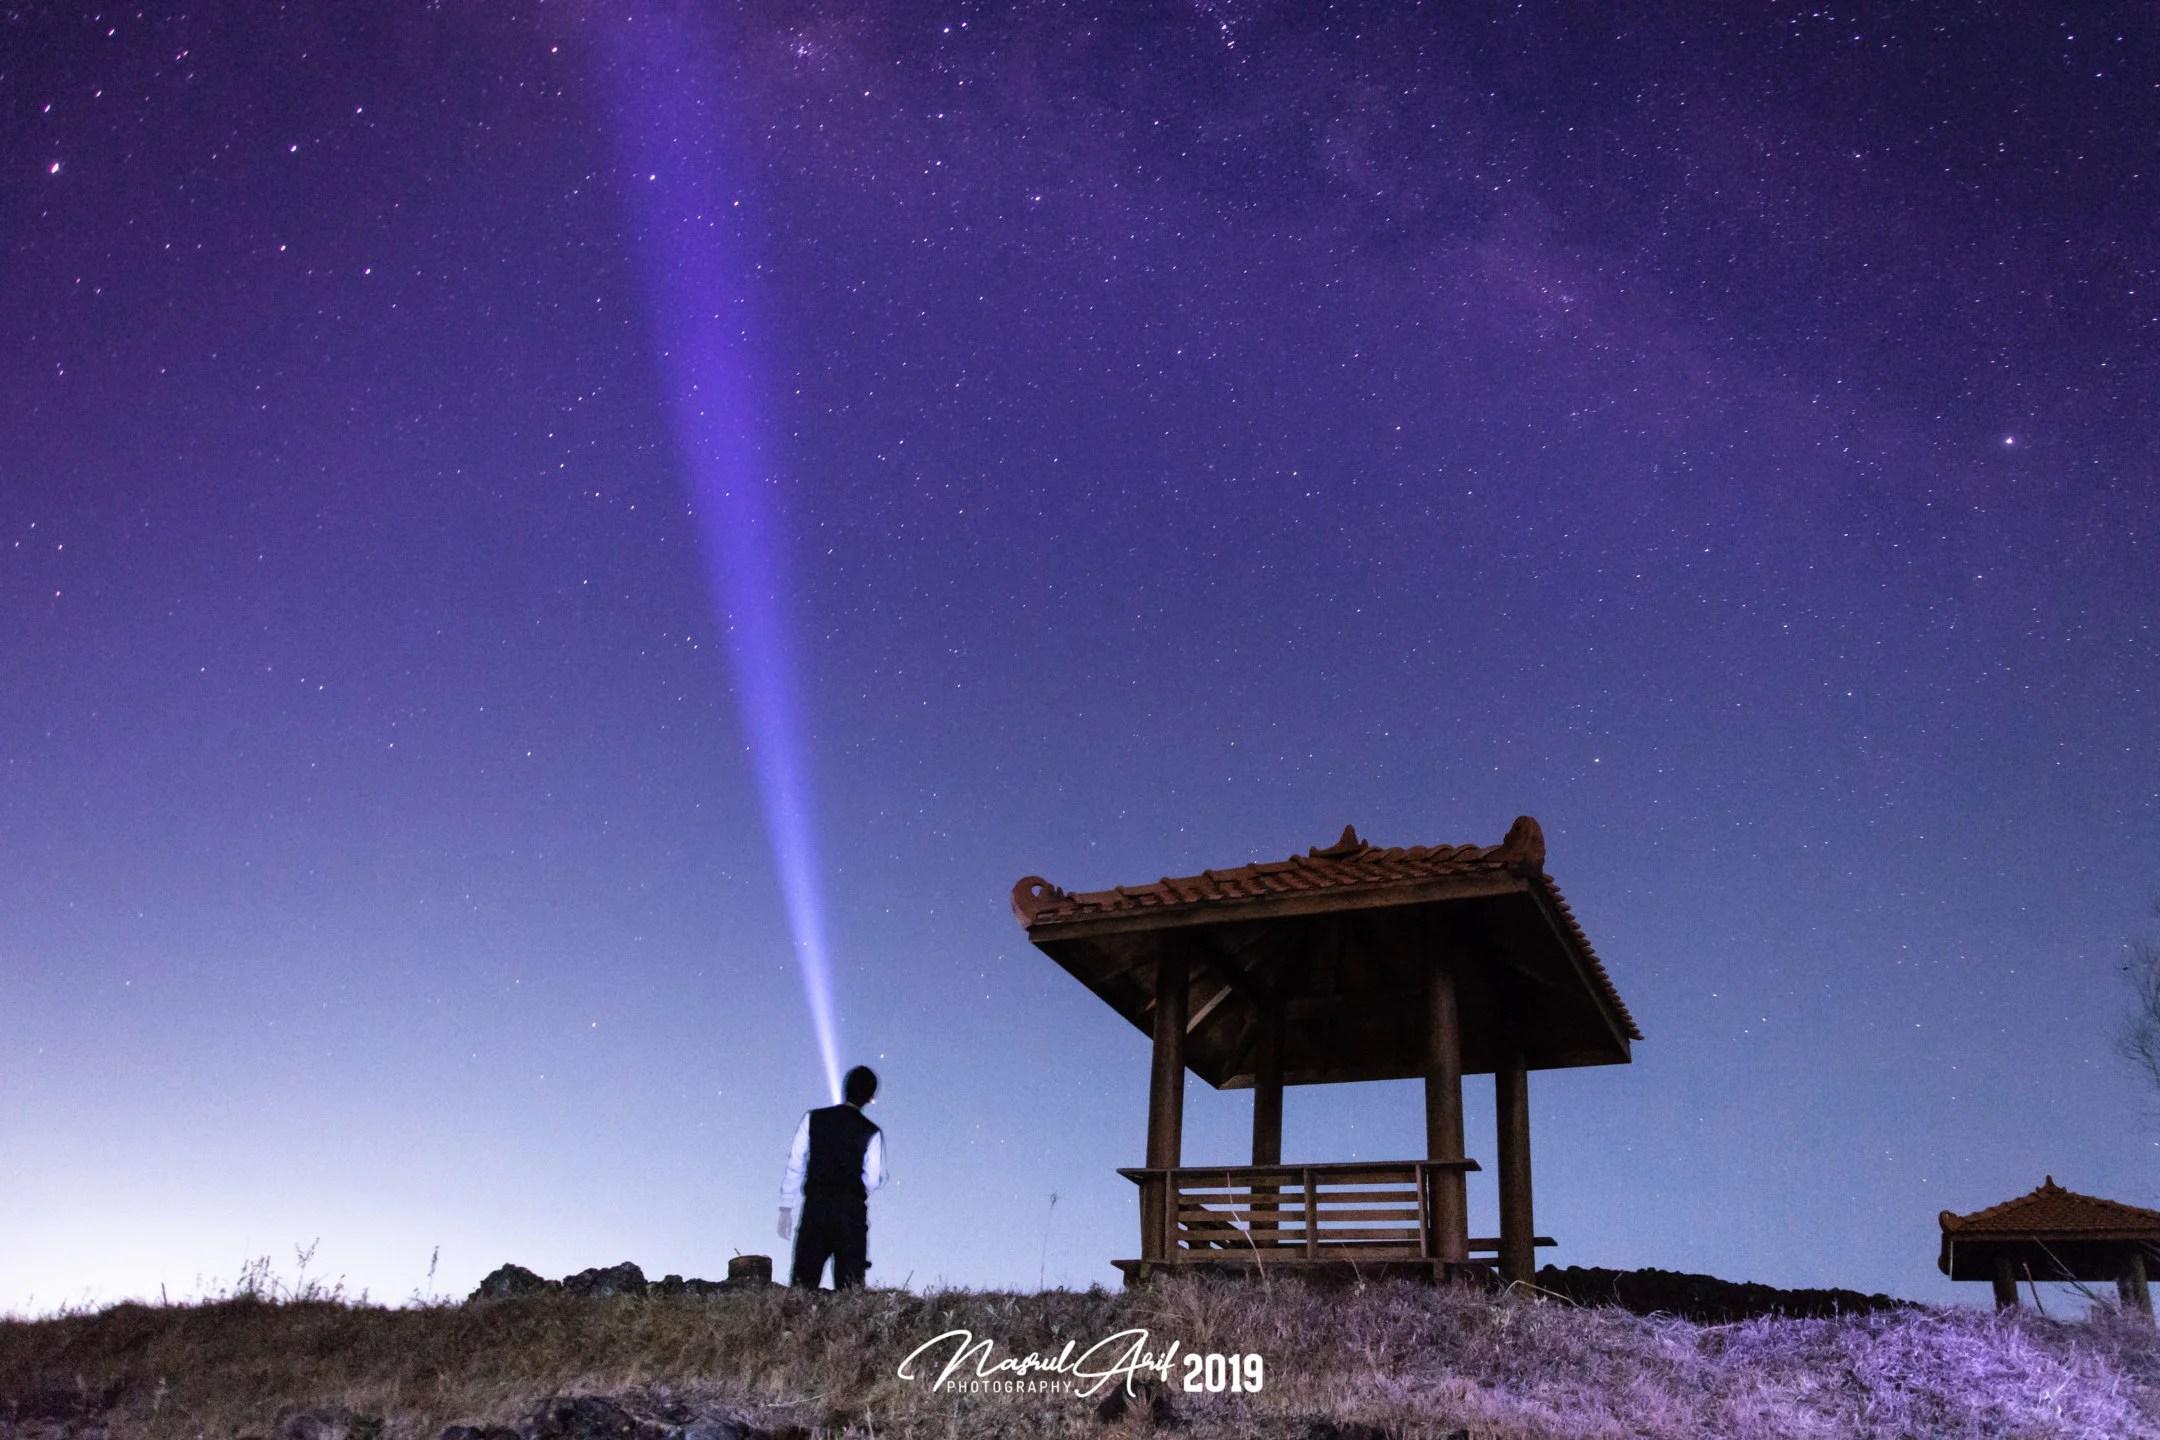 Milky way di Gunung Ireng Gununung Kidul Yogyakarta